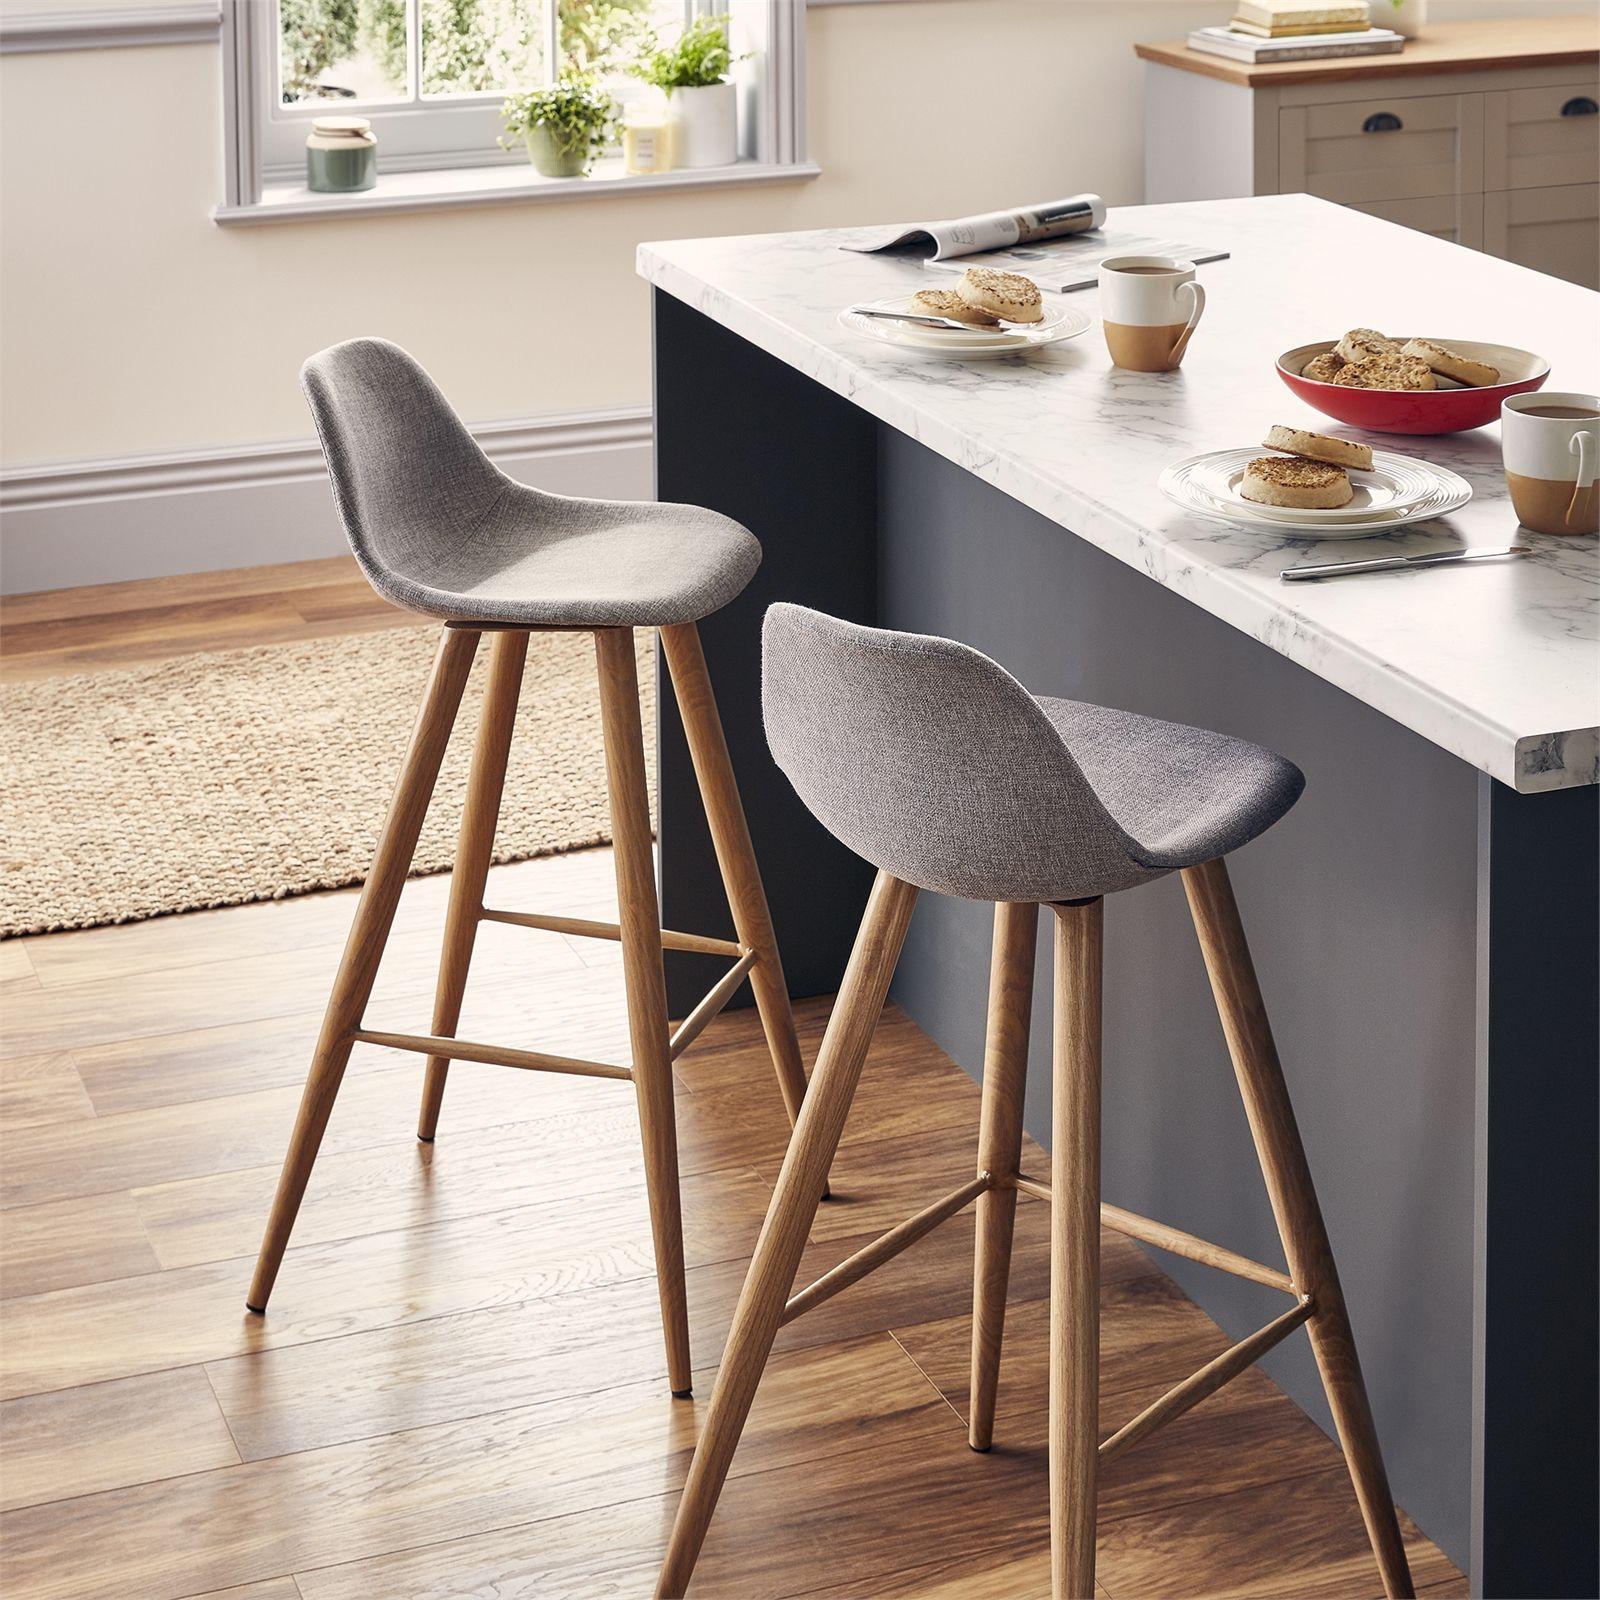 Homebase UK   Oak bar stools, Bar chairs, Homebase kitchens